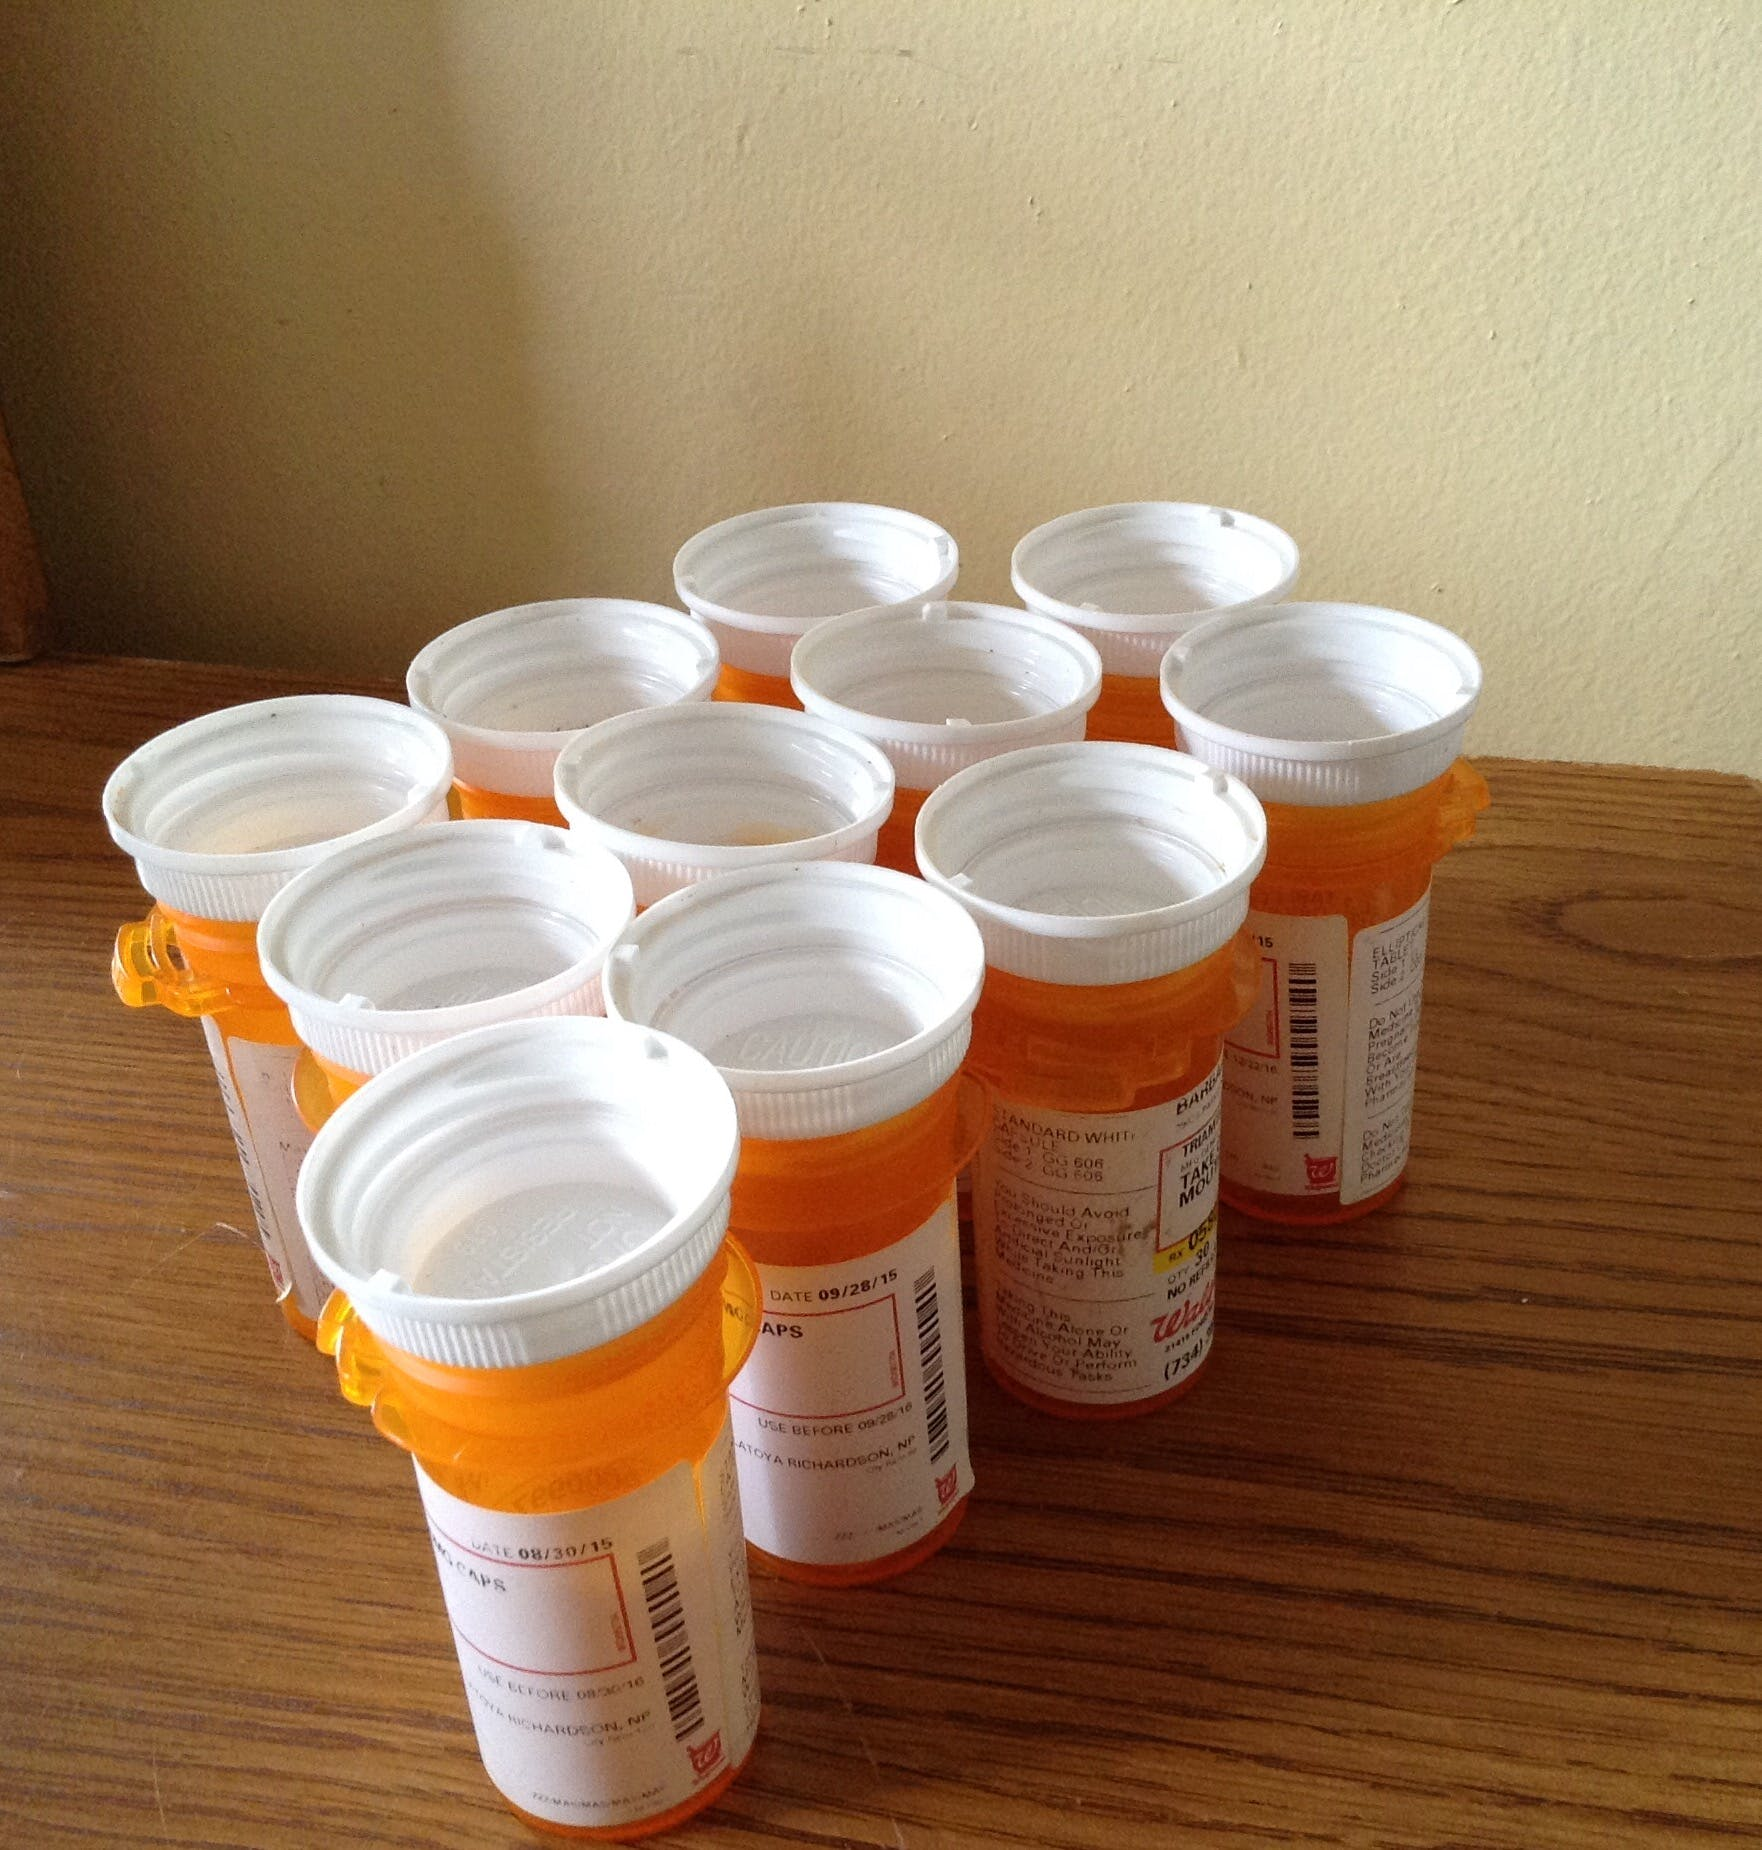 Free stock photo of Pill bottle